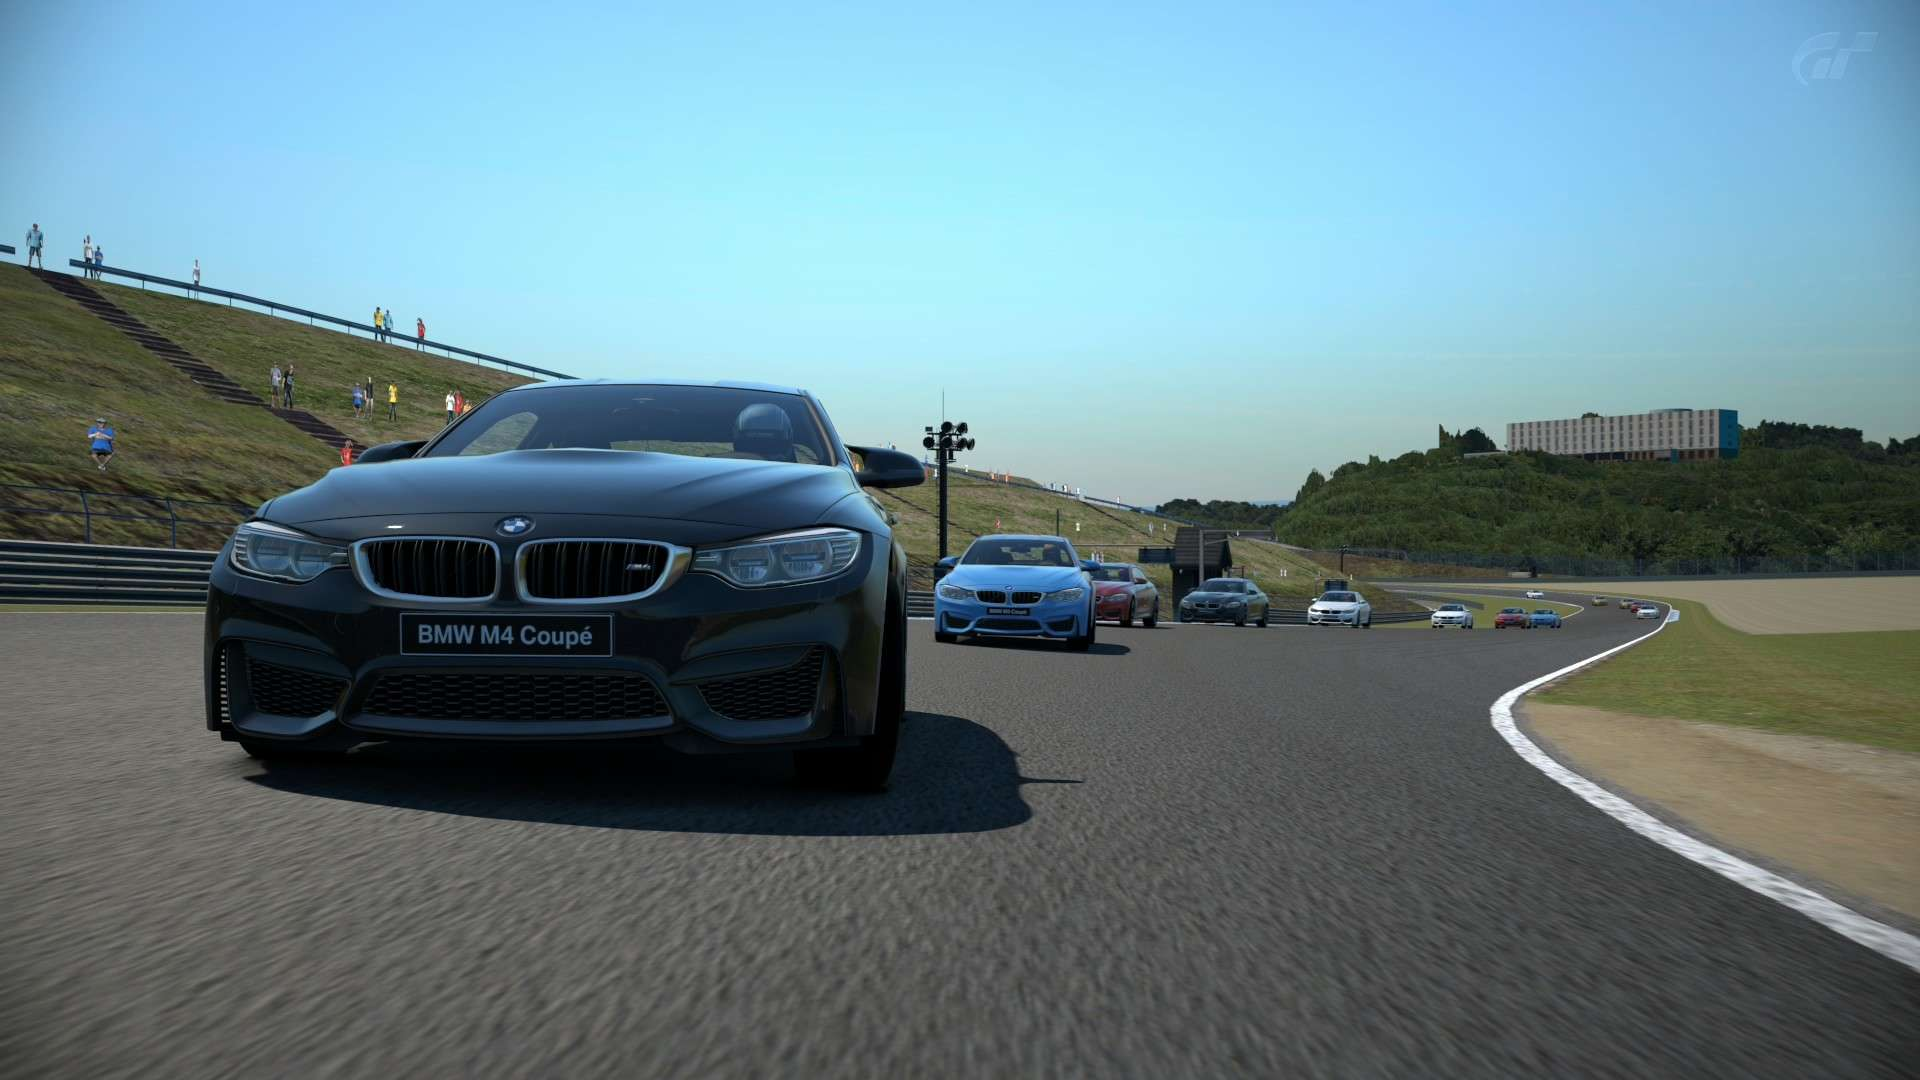 Crónica del BMW M4 Coupé en Motegi Twin_r15